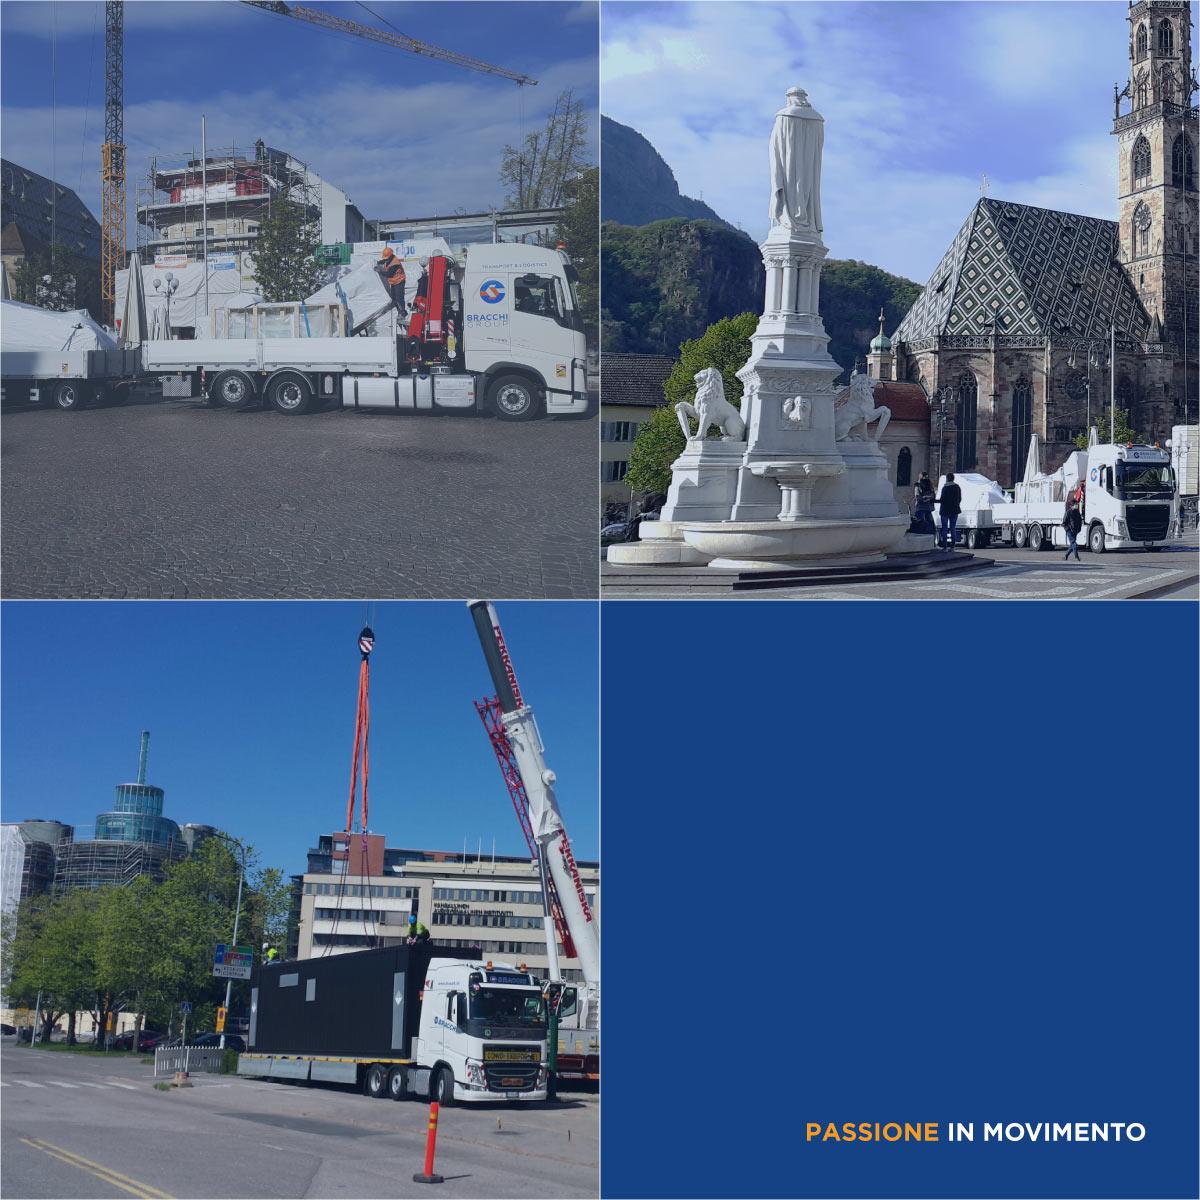 lift industry logistics transports